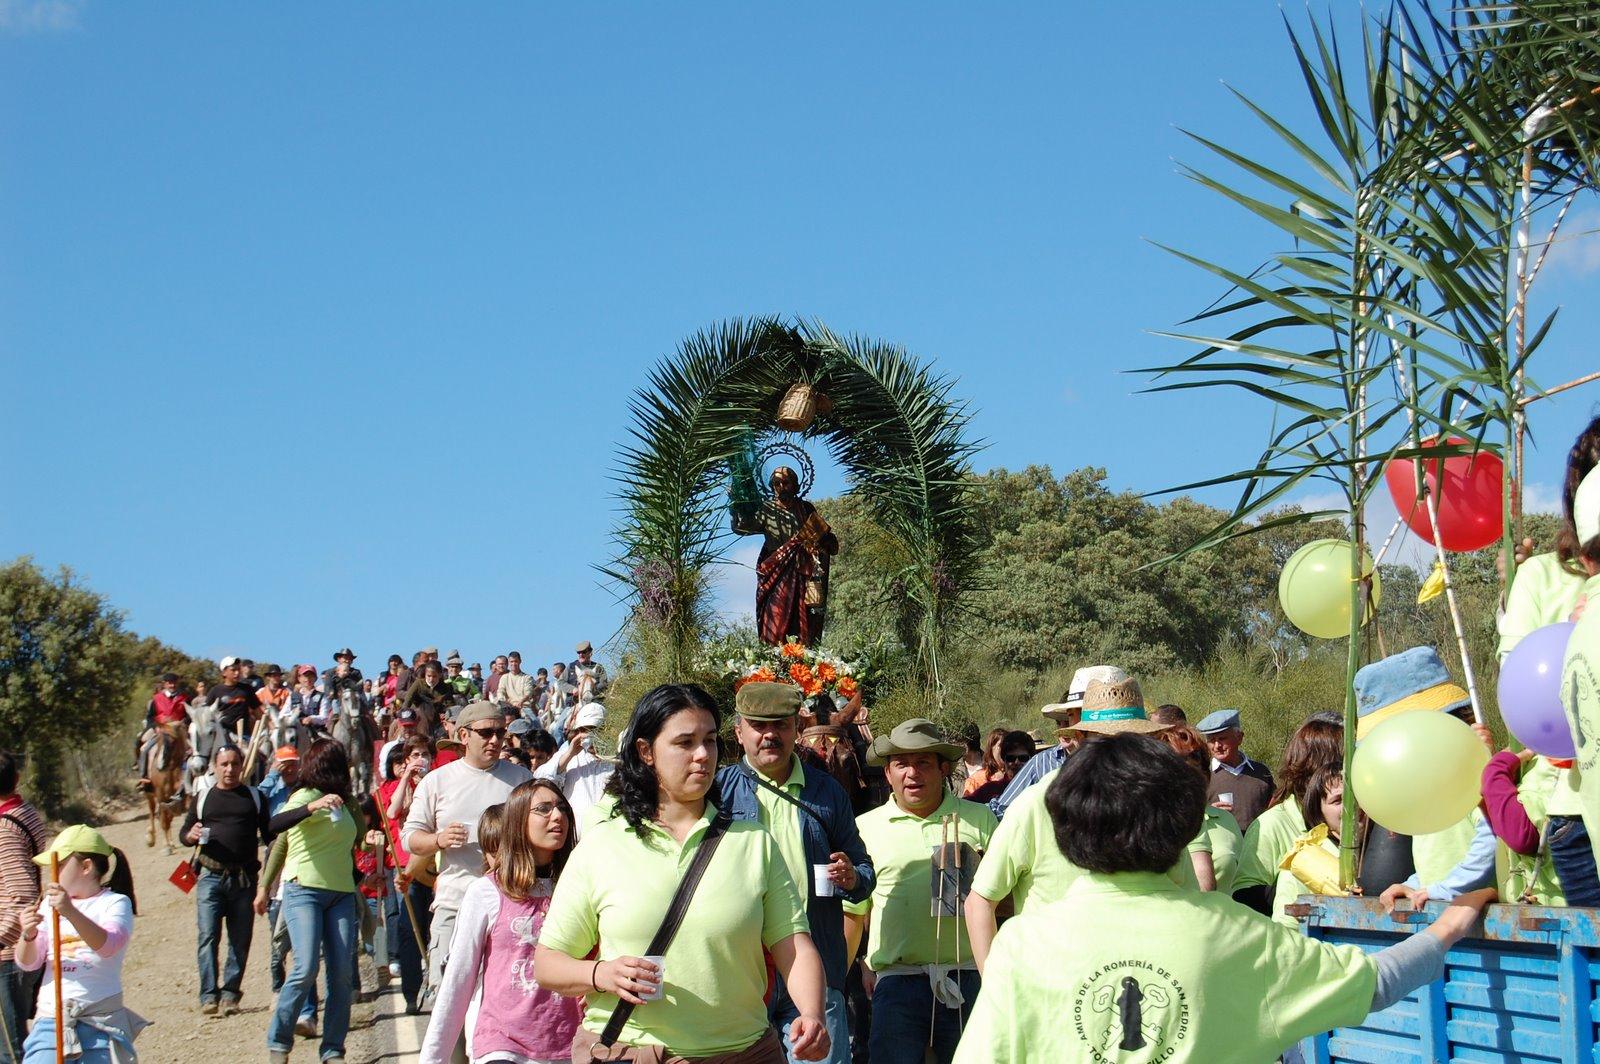 www.torrejoncillotodonoticias.com_romeria_de_torrejoncillo_a_san_pedro-_2009_0012